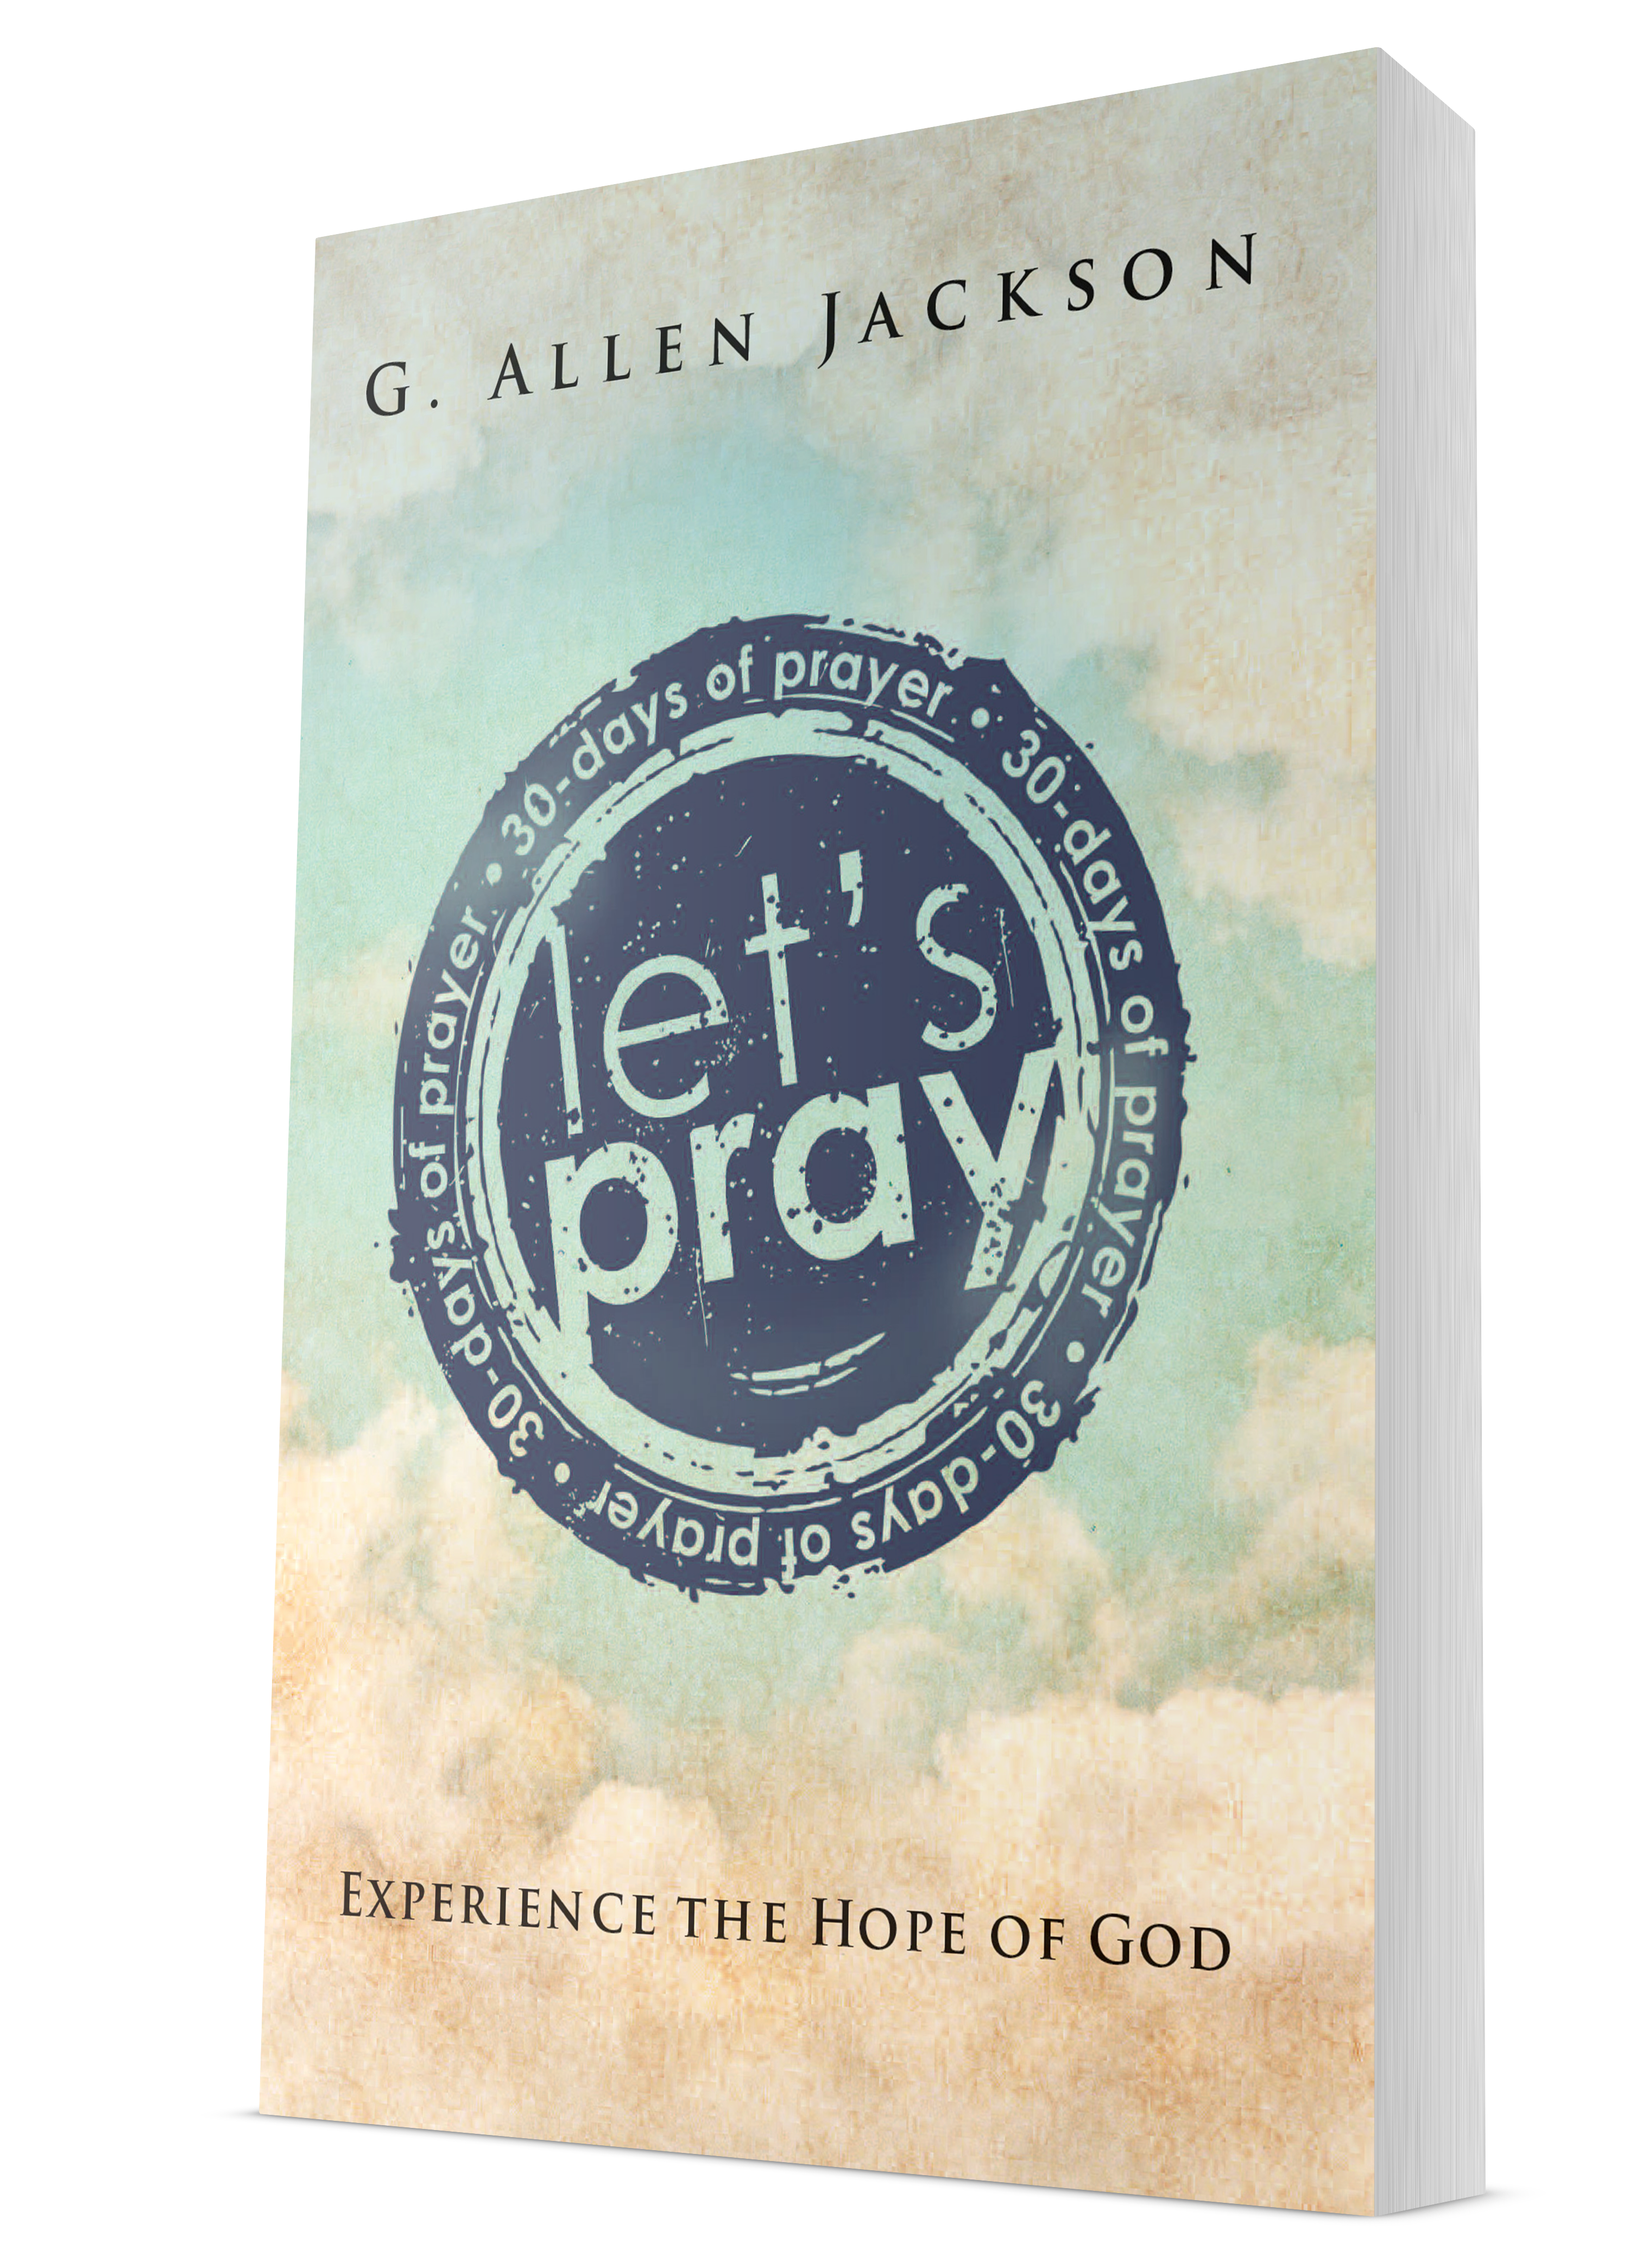 Let's Pray: 30 Days of Prayer